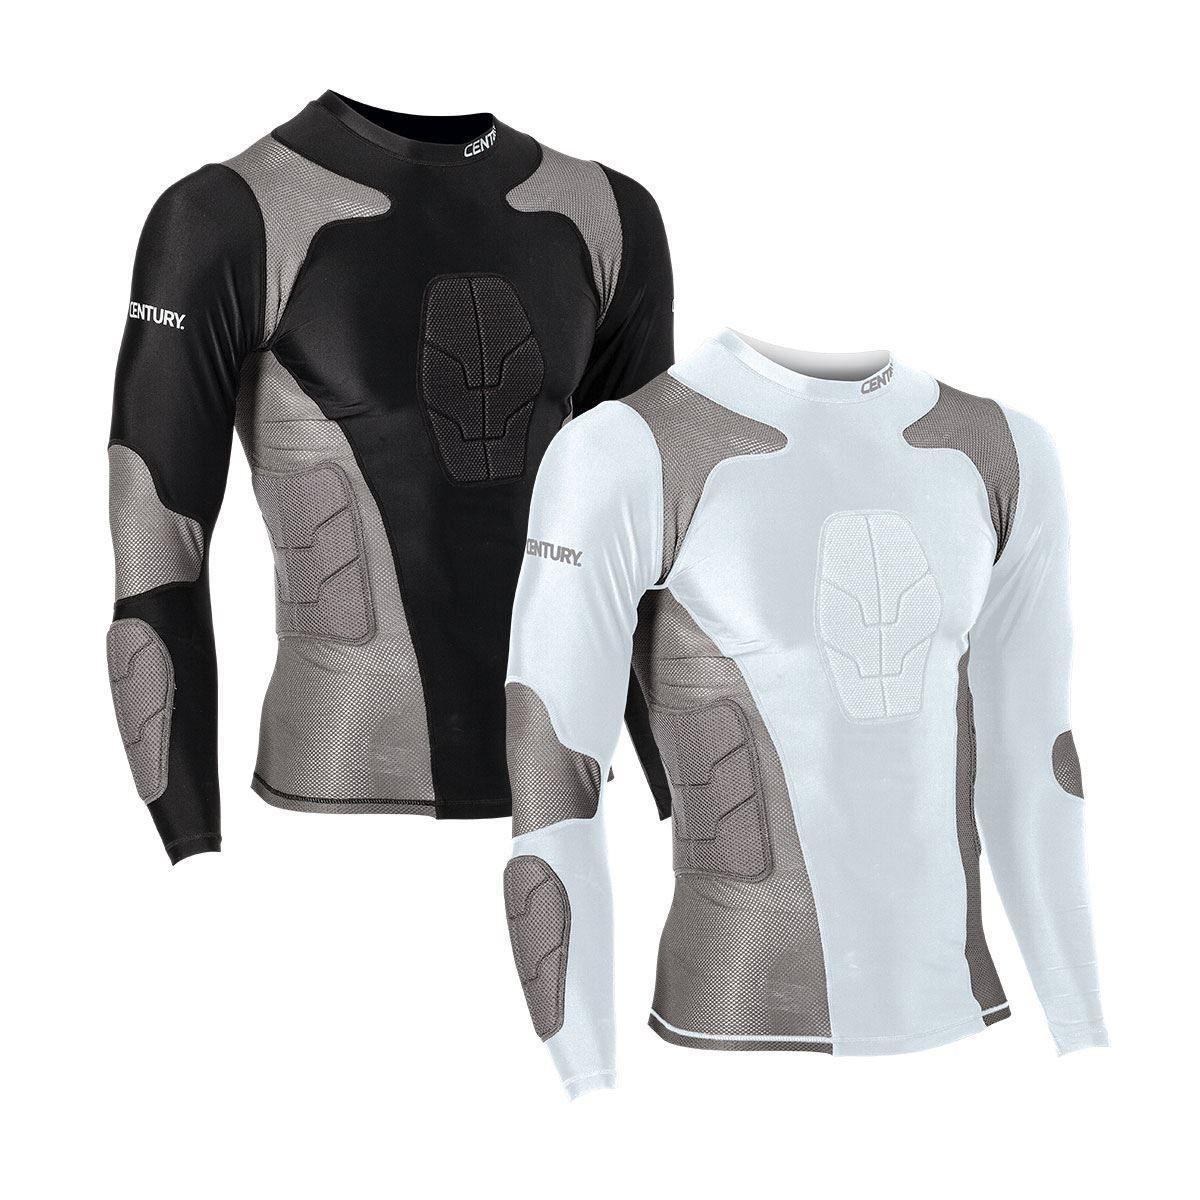 Century long sleeve padded compression shirt padded